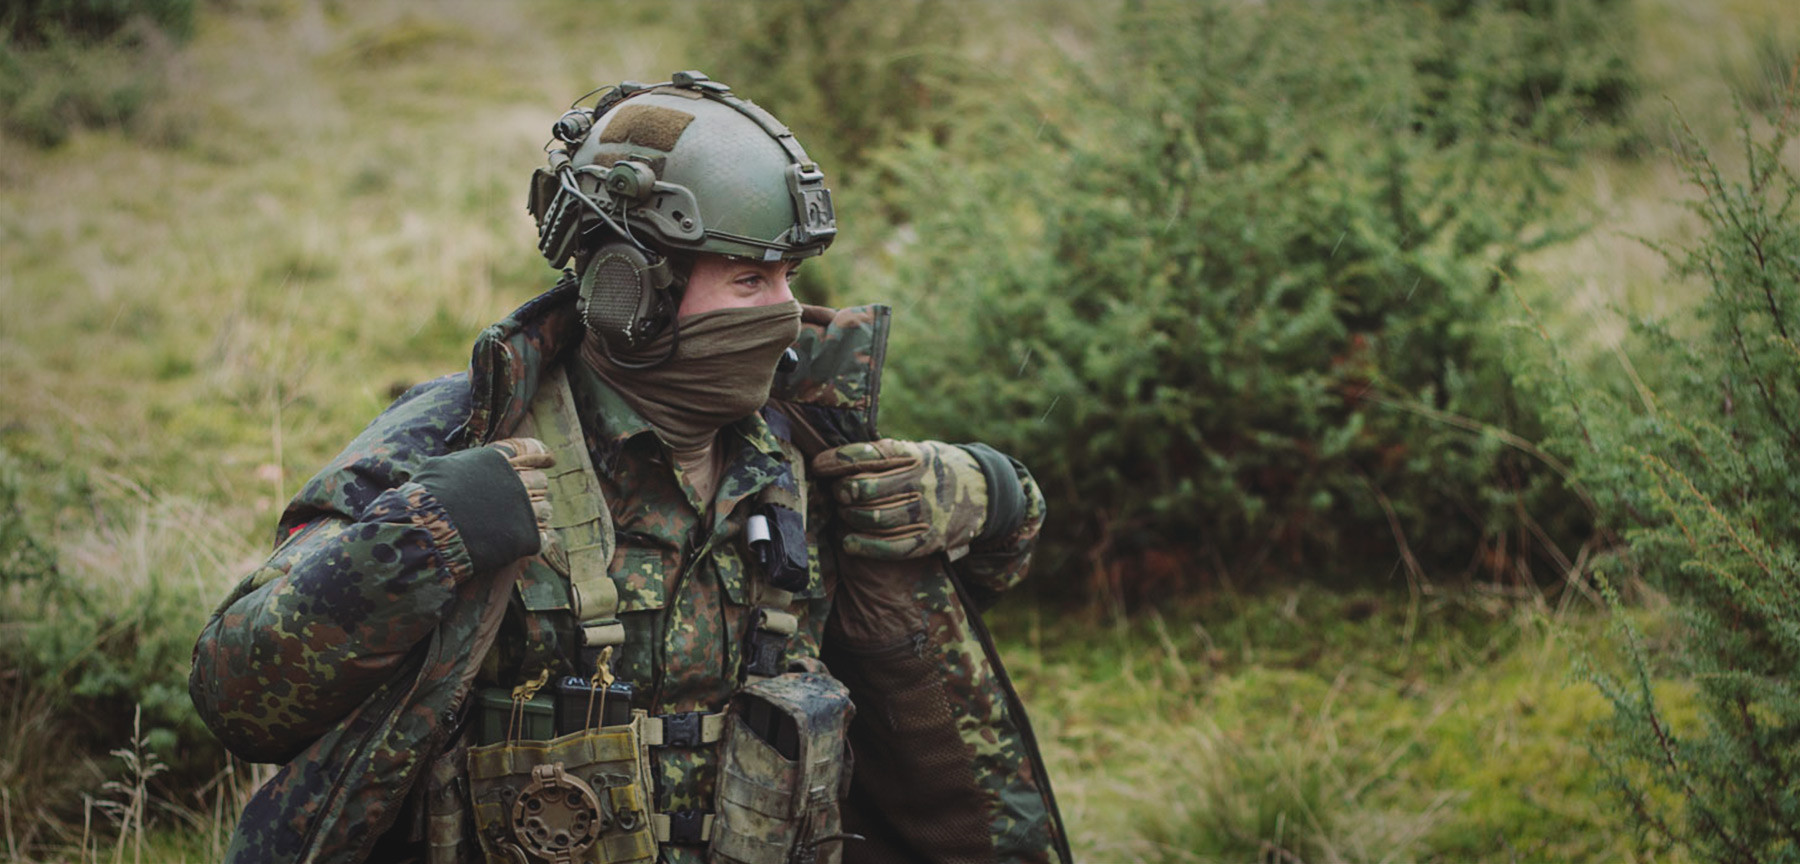 Carinthia HIG Jacket Spezialkräfte KSK